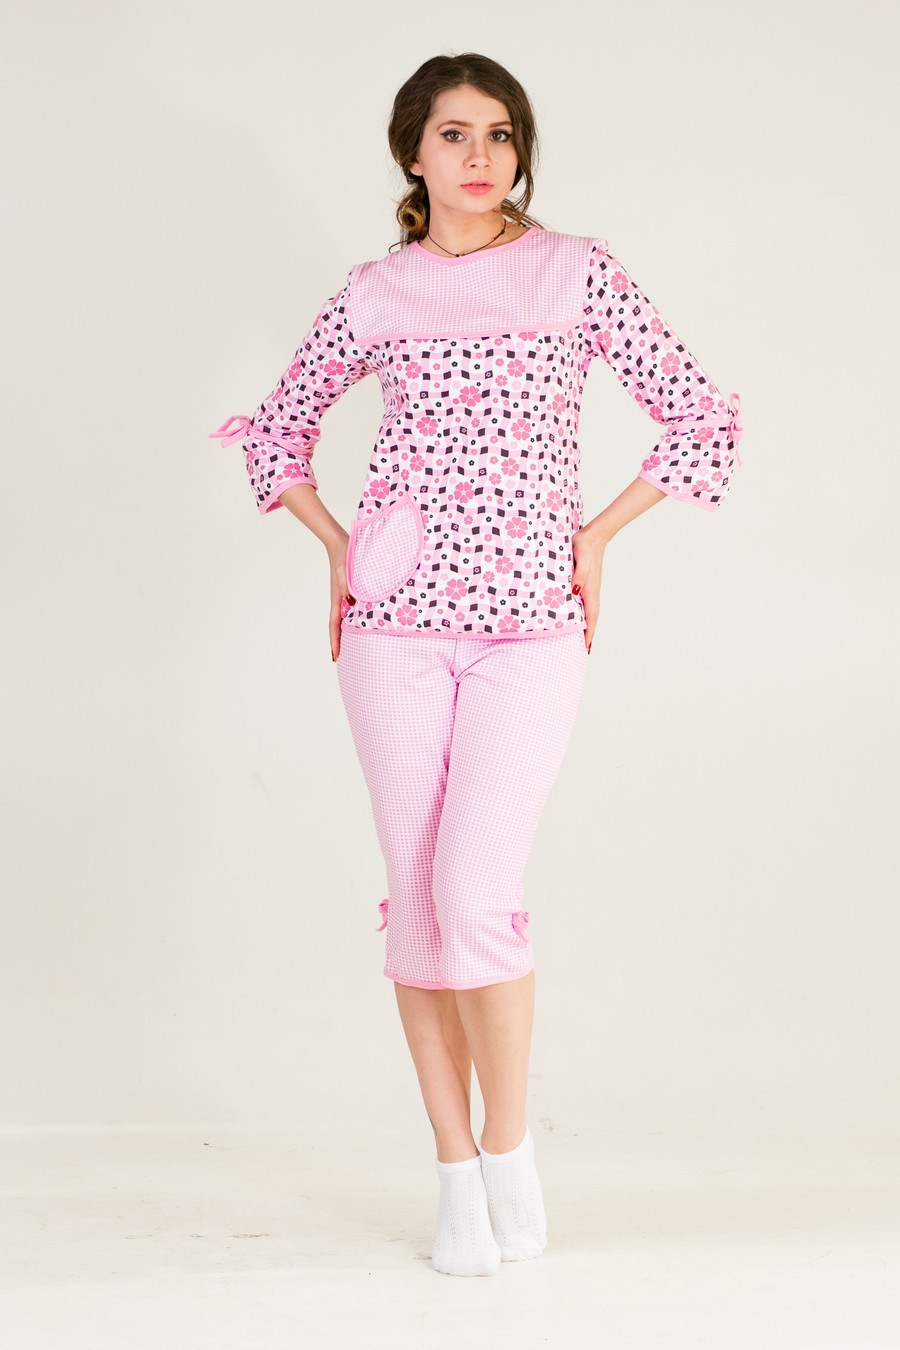 Пижама Катя Цветочки кофта +бриджиДомашняя одежда<br><br><br>Размер: 56